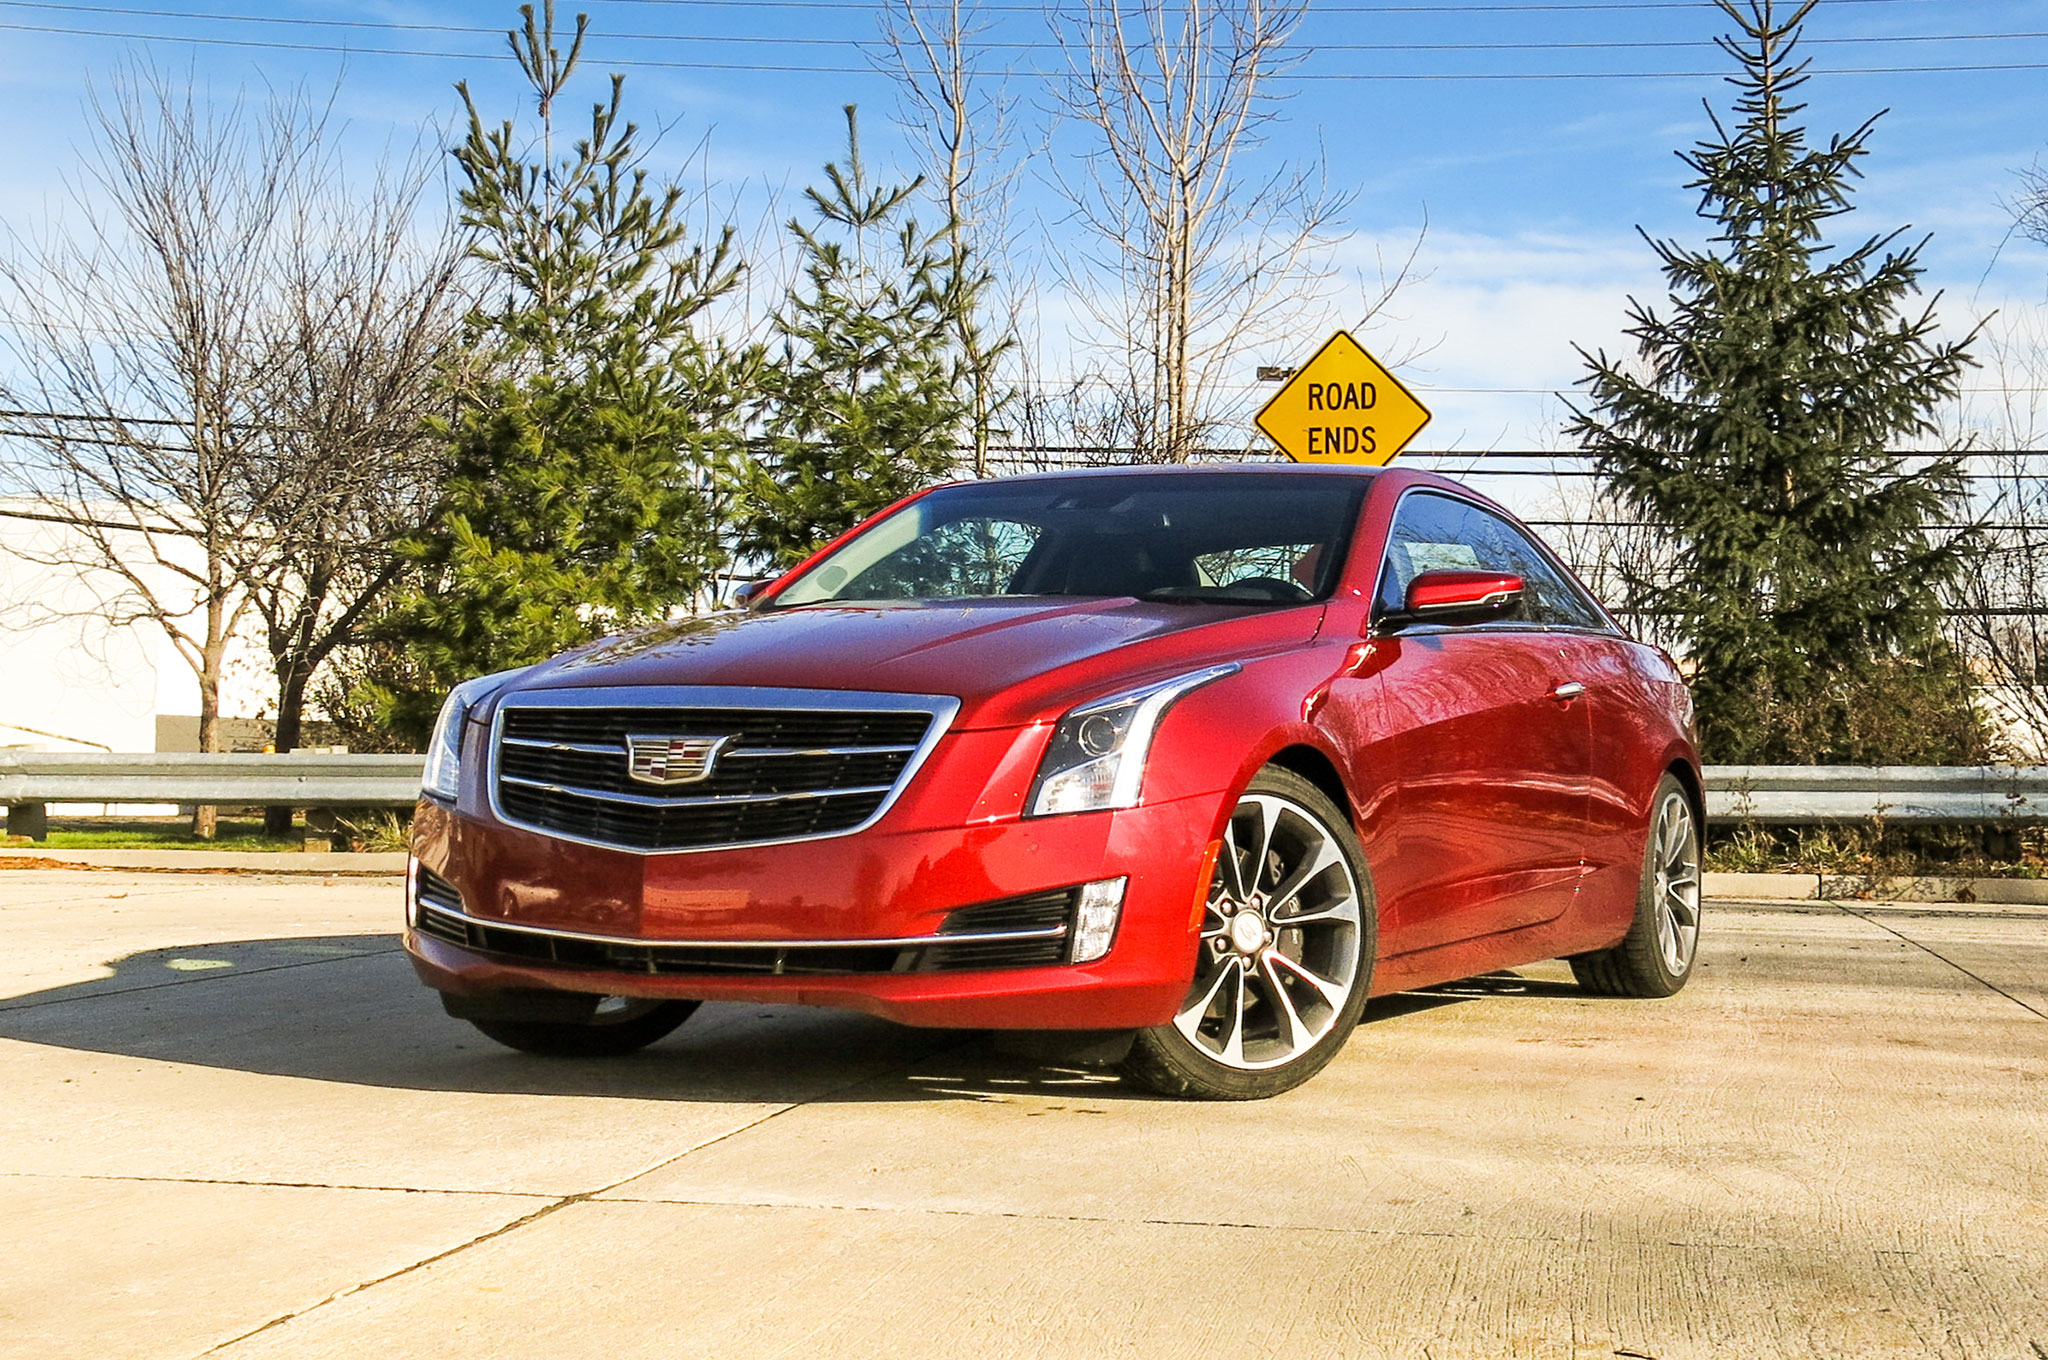 2016 Cadillac Ats Coupe 3 6l Premium Review